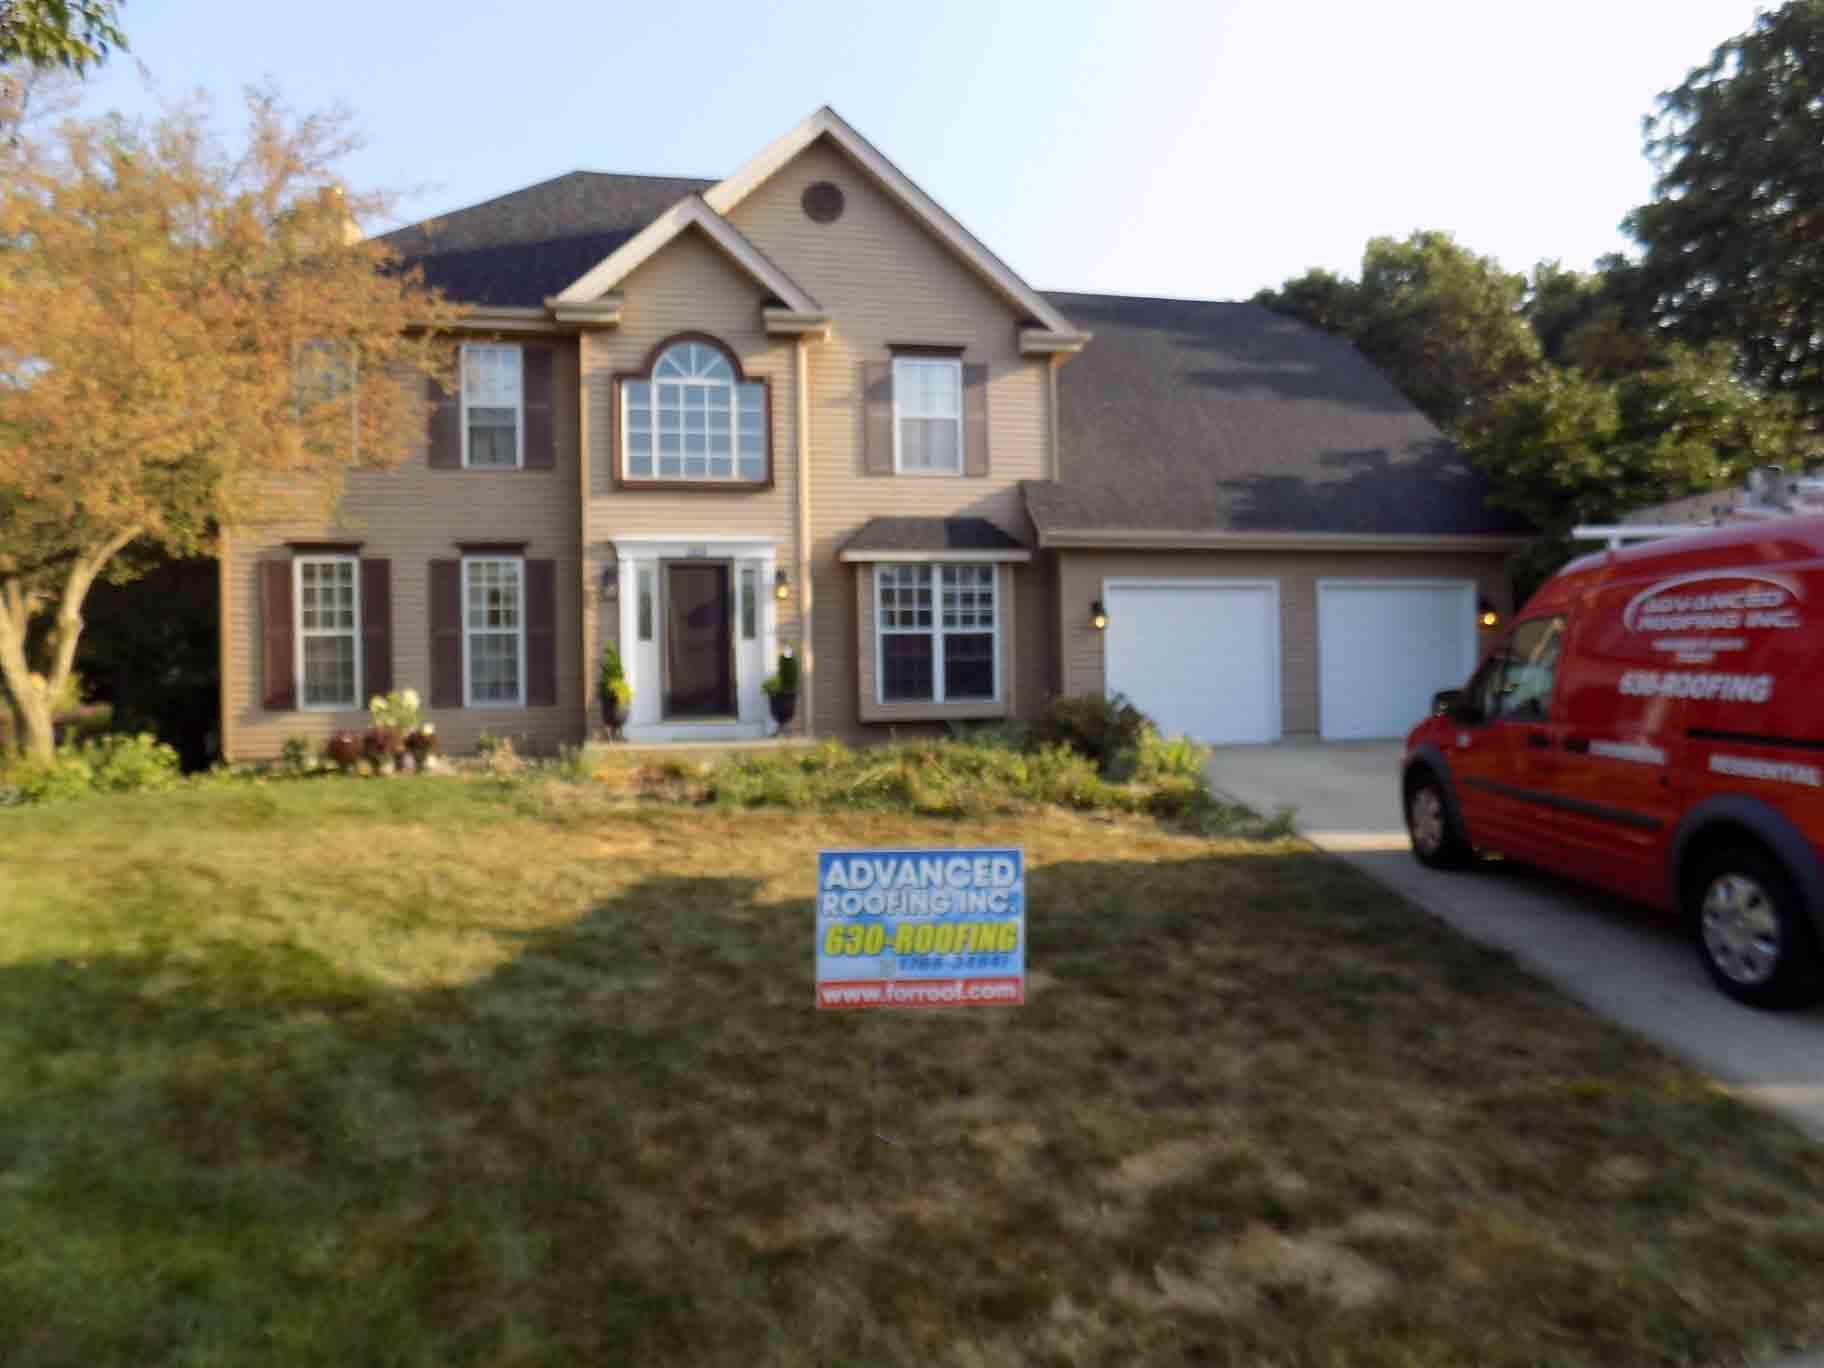 Roof-Maintenance-Services-North-Aurora-IL